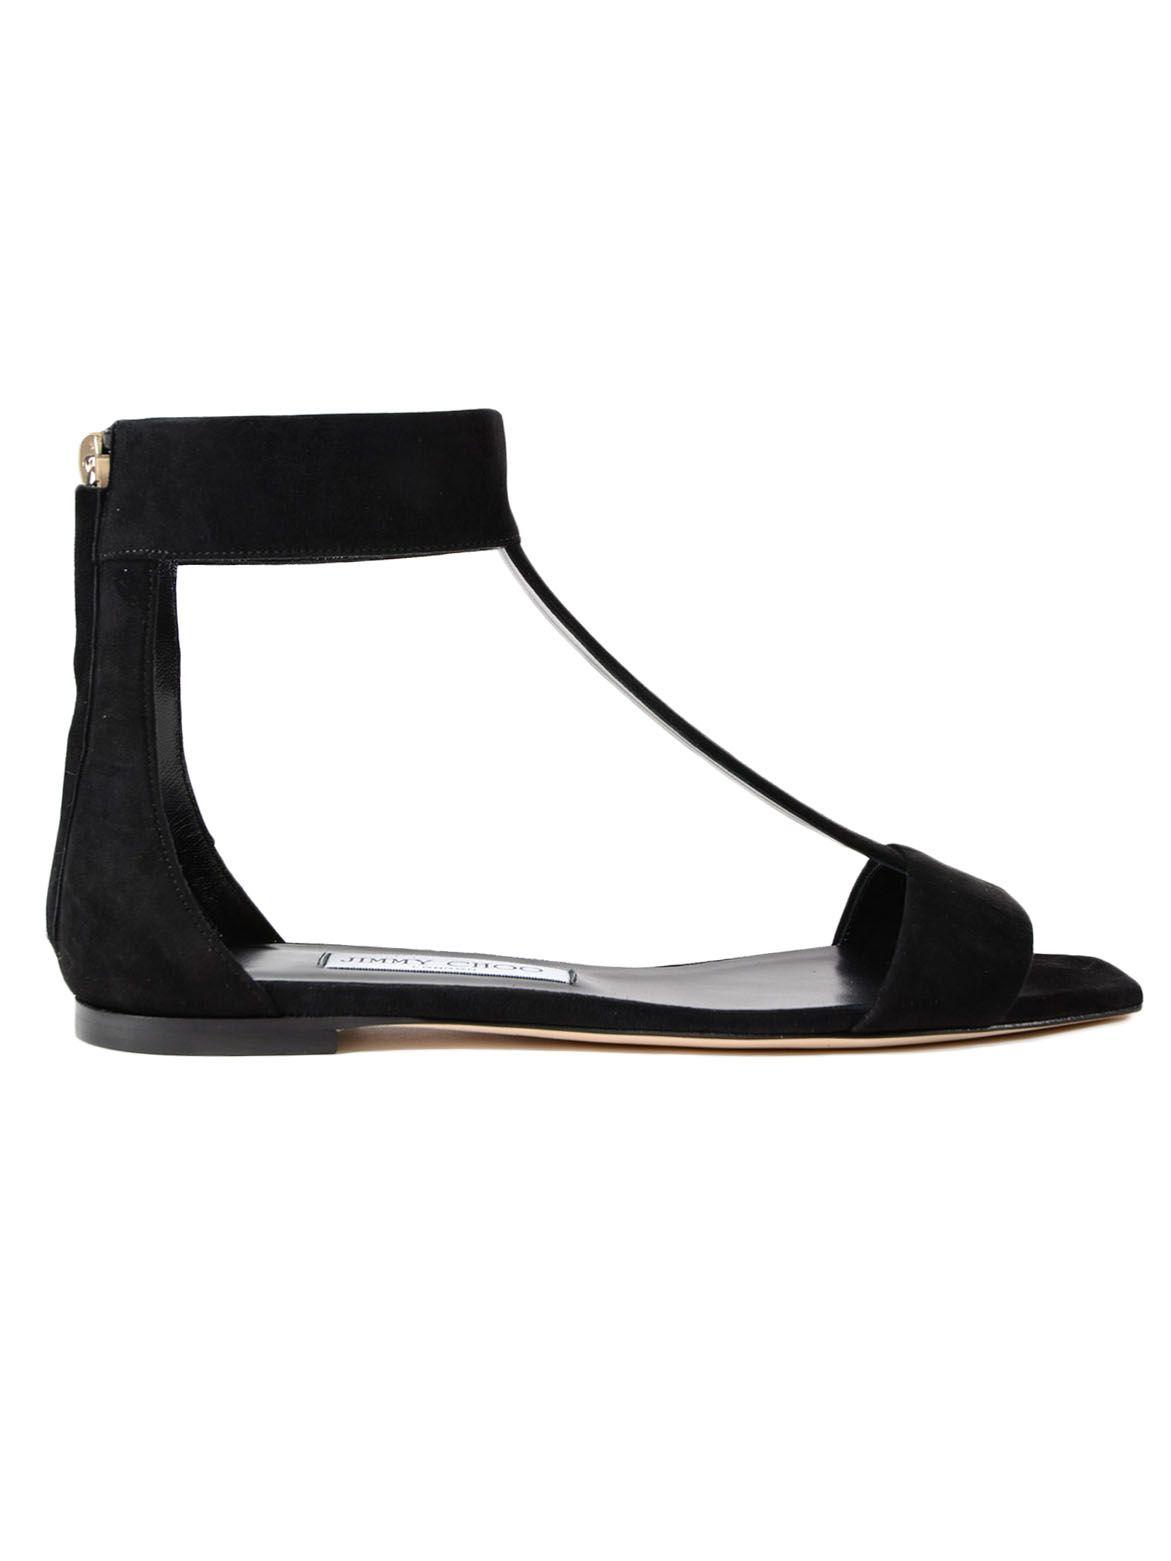 Jimmy Choo Flat Sandal